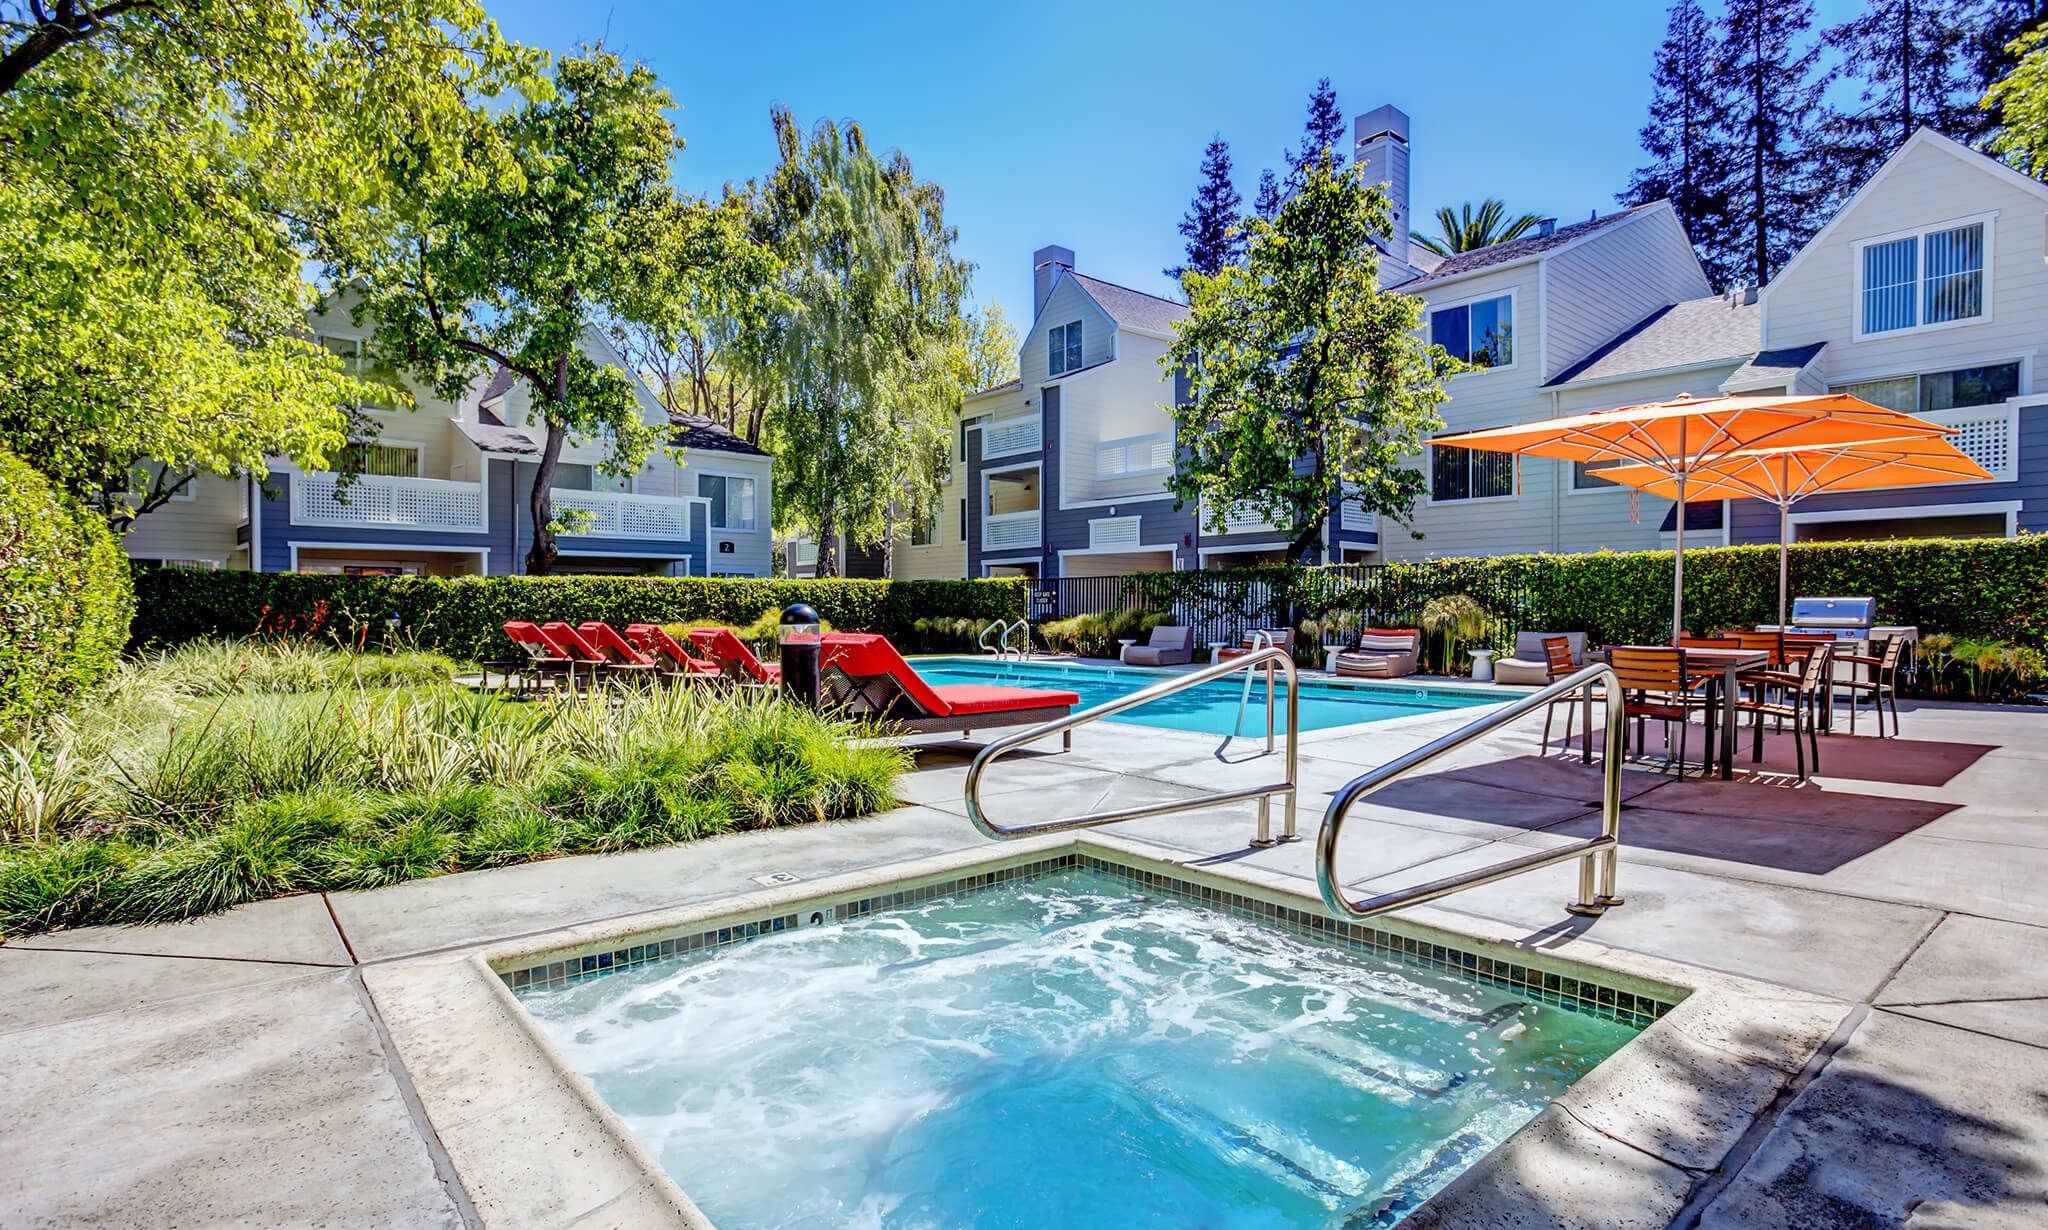 Timberleaf Apartments apartments in Santa Clara CA to rent photo 7